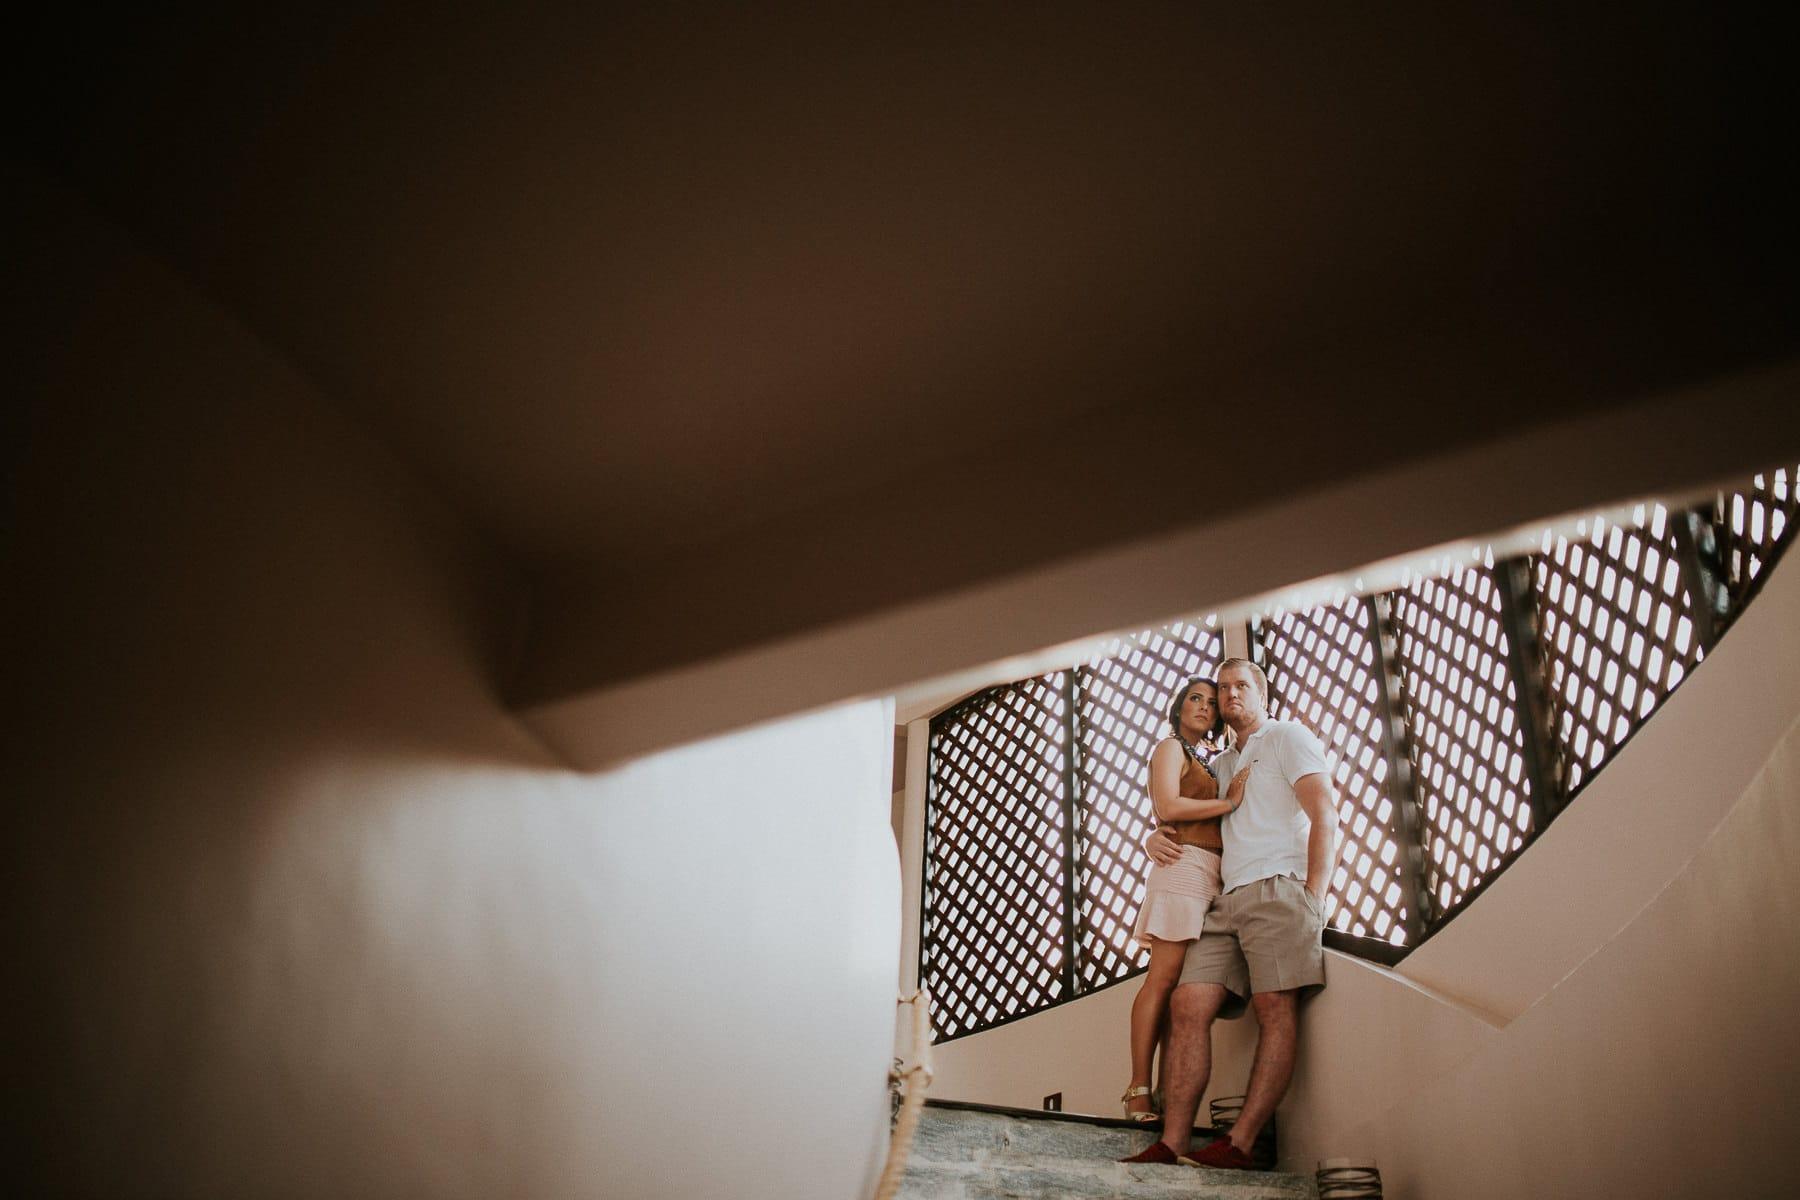 sessao-casal-lara-hotel-aquiraz-12